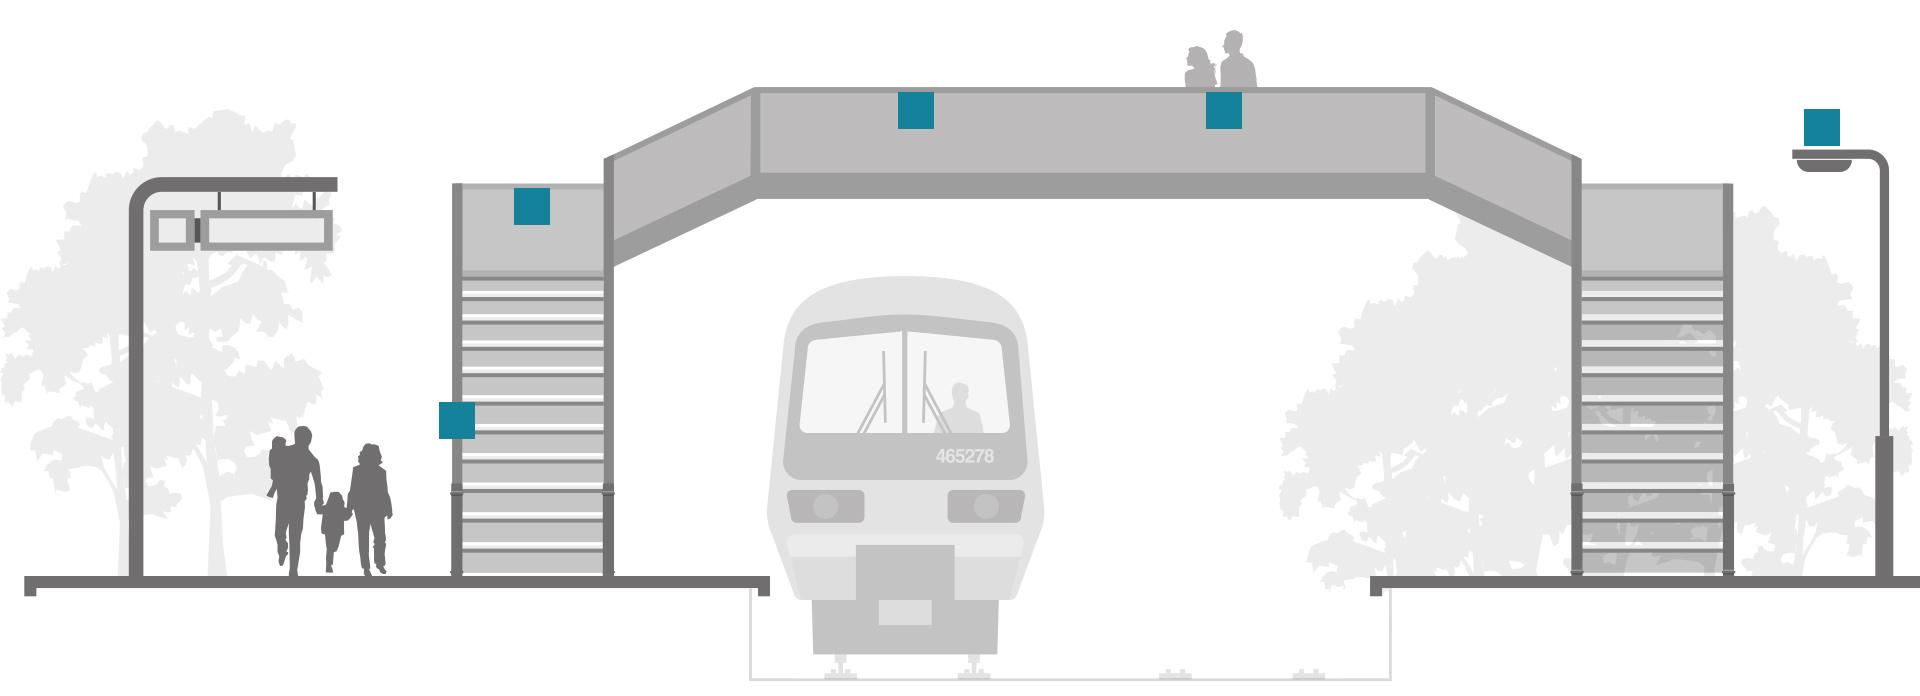 Transportapplications_stairs_foot_bridges